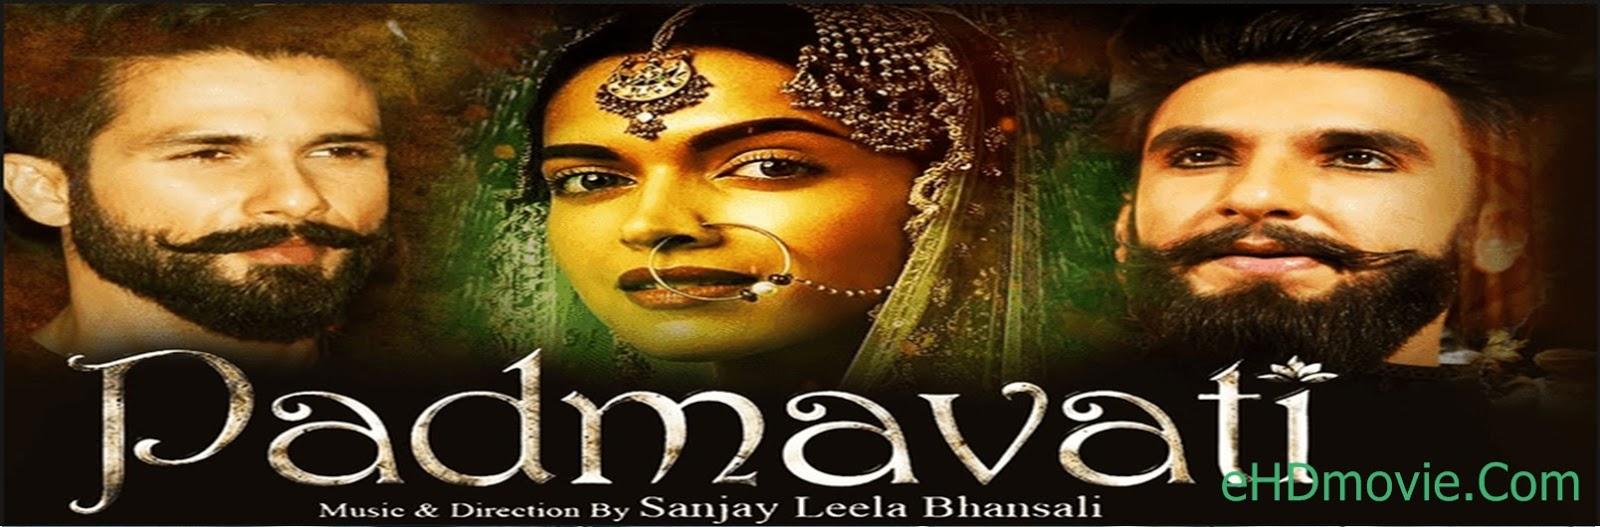 Padmaavat 2018 Full Movie Hindi 720p - HEVC - 480p ORG BRRip 450MB - 600MB - 700MB - 1.4GB ESubs Free Download